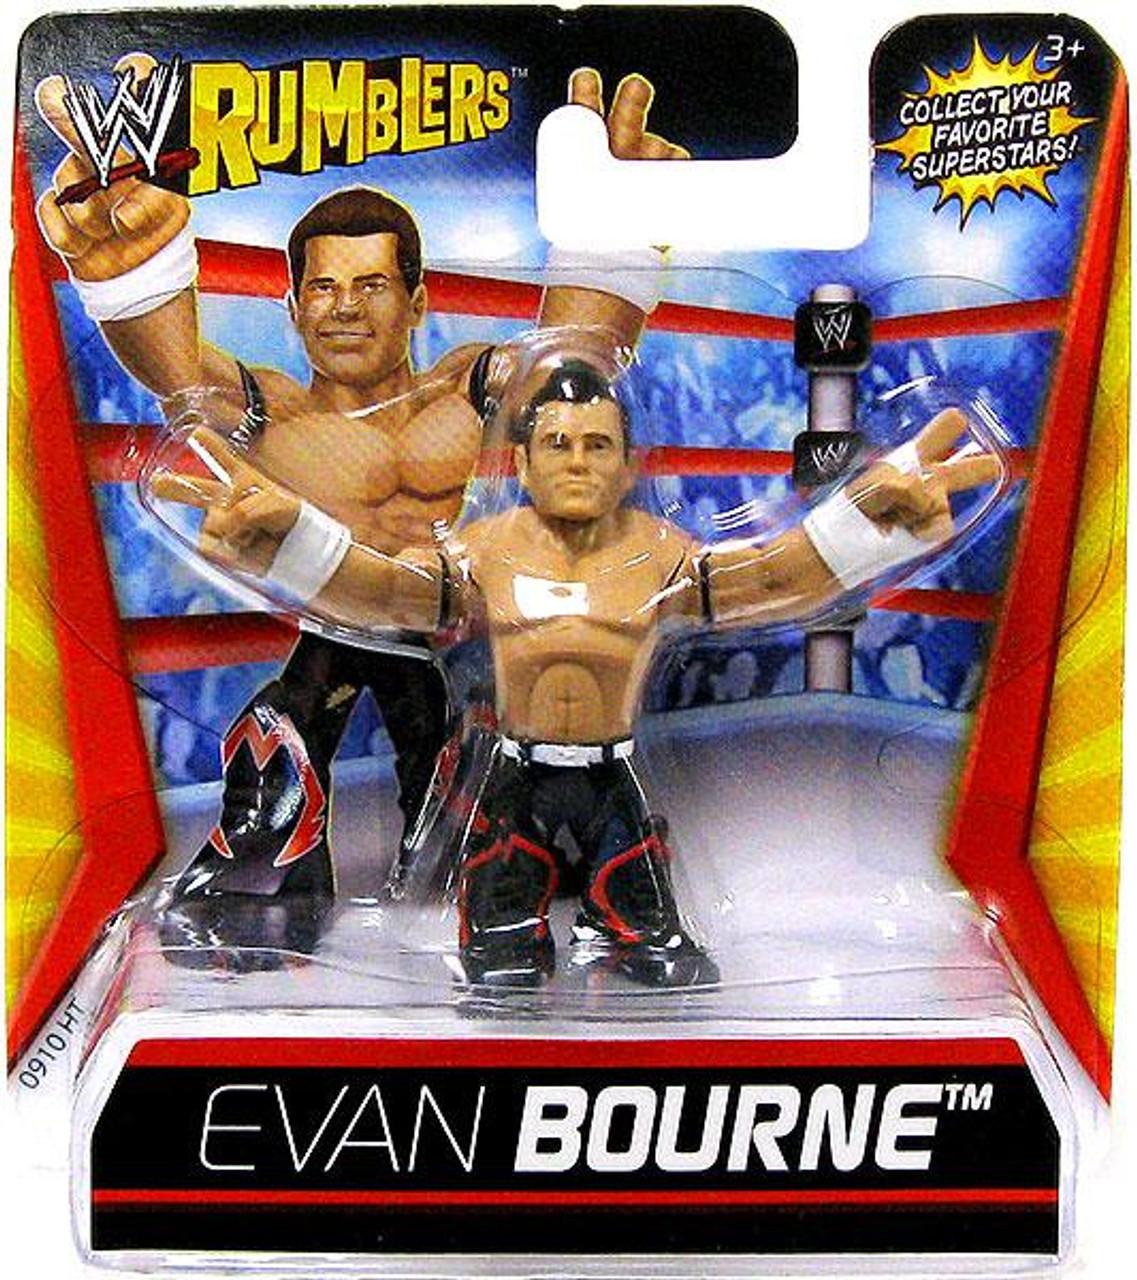 WWE RUMBLERS WRESTLING TITANTRON TOWER EVAN BOURNE ACTION FIGURE BIG MATTEL TOY